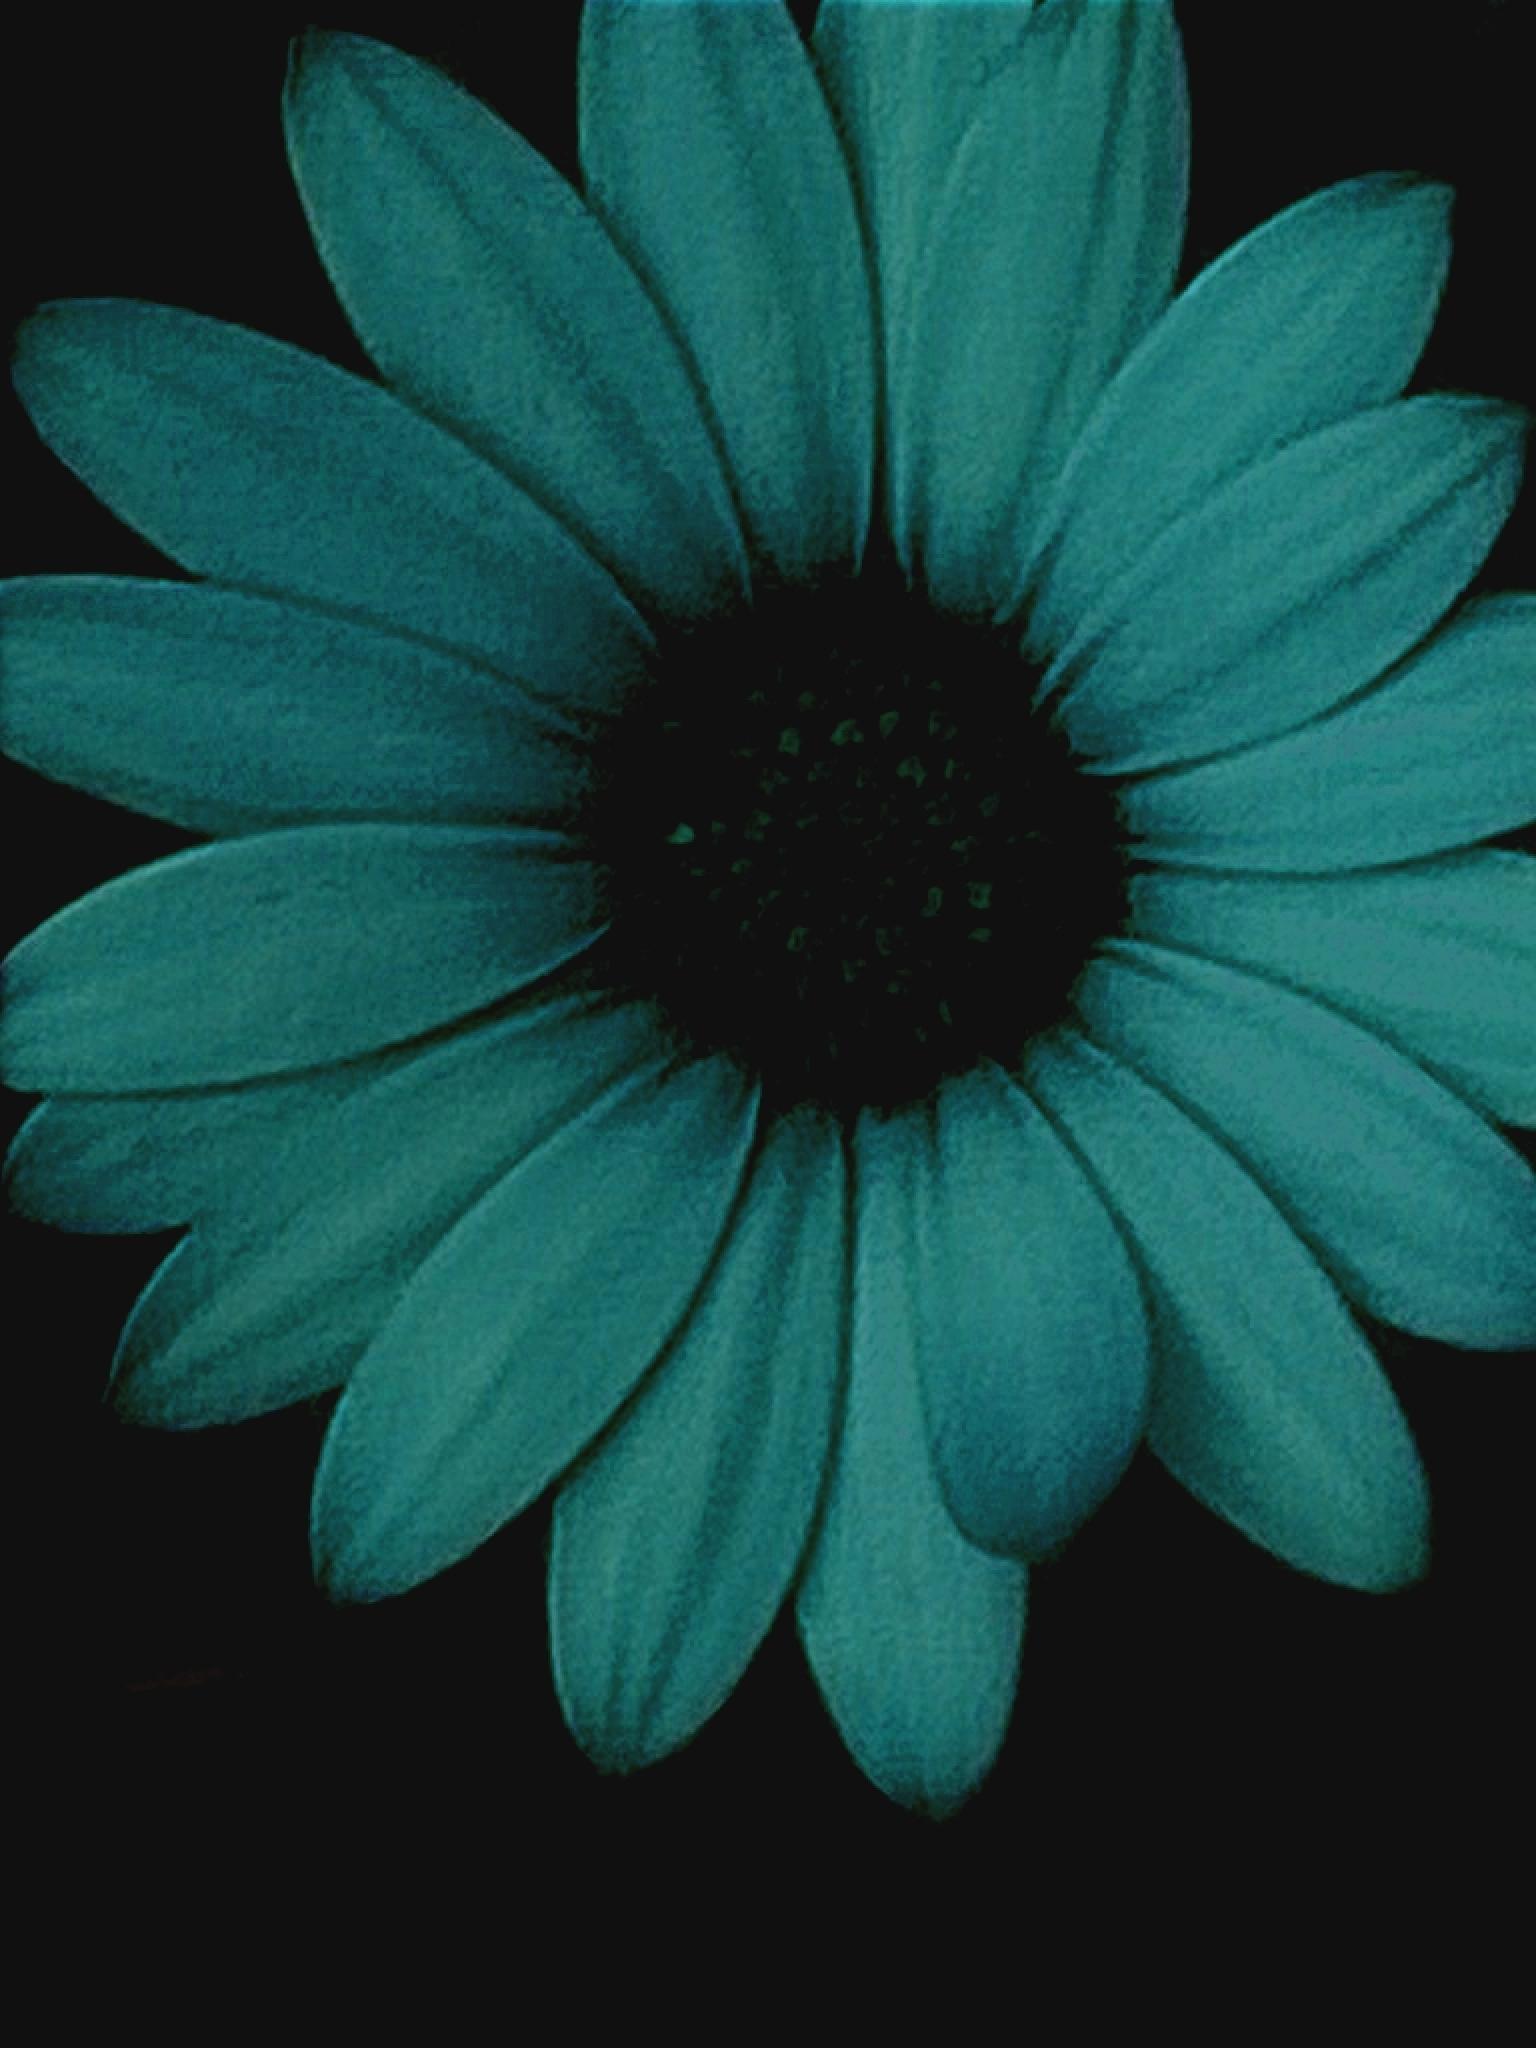 Blue Flower by gemma smith